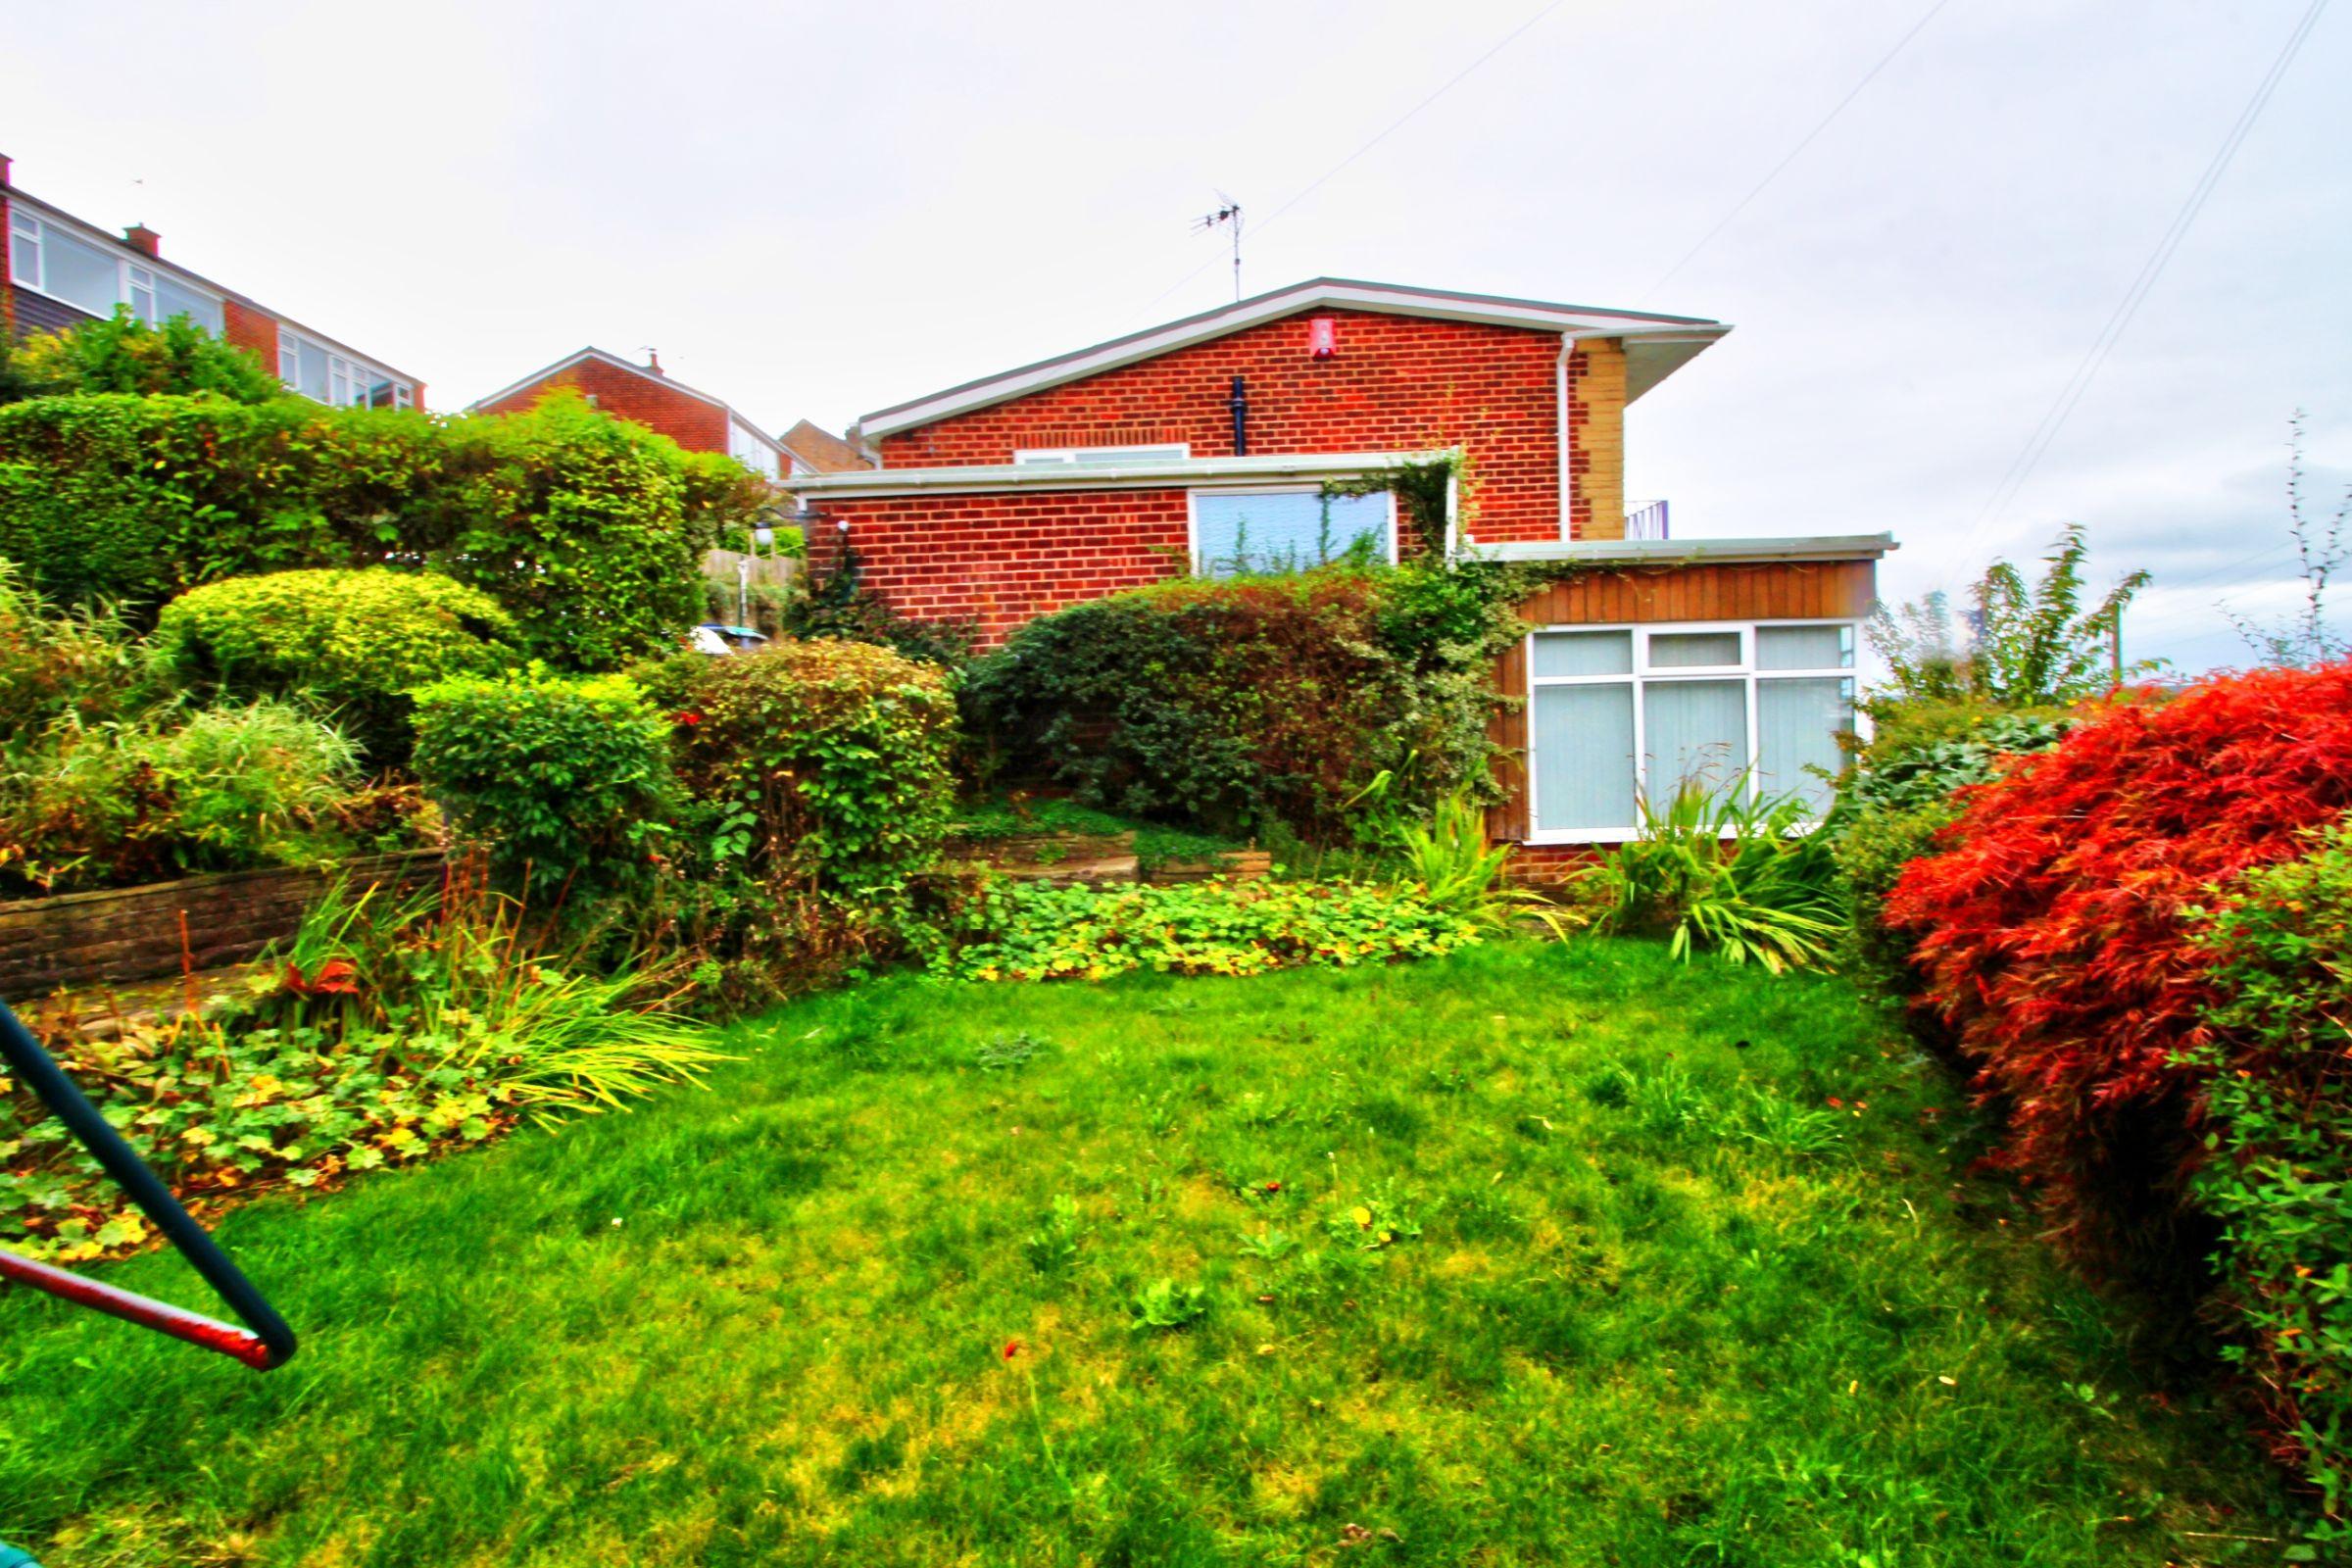 Derwent Terrace, Burnopfield, Newcastle upon Tyne